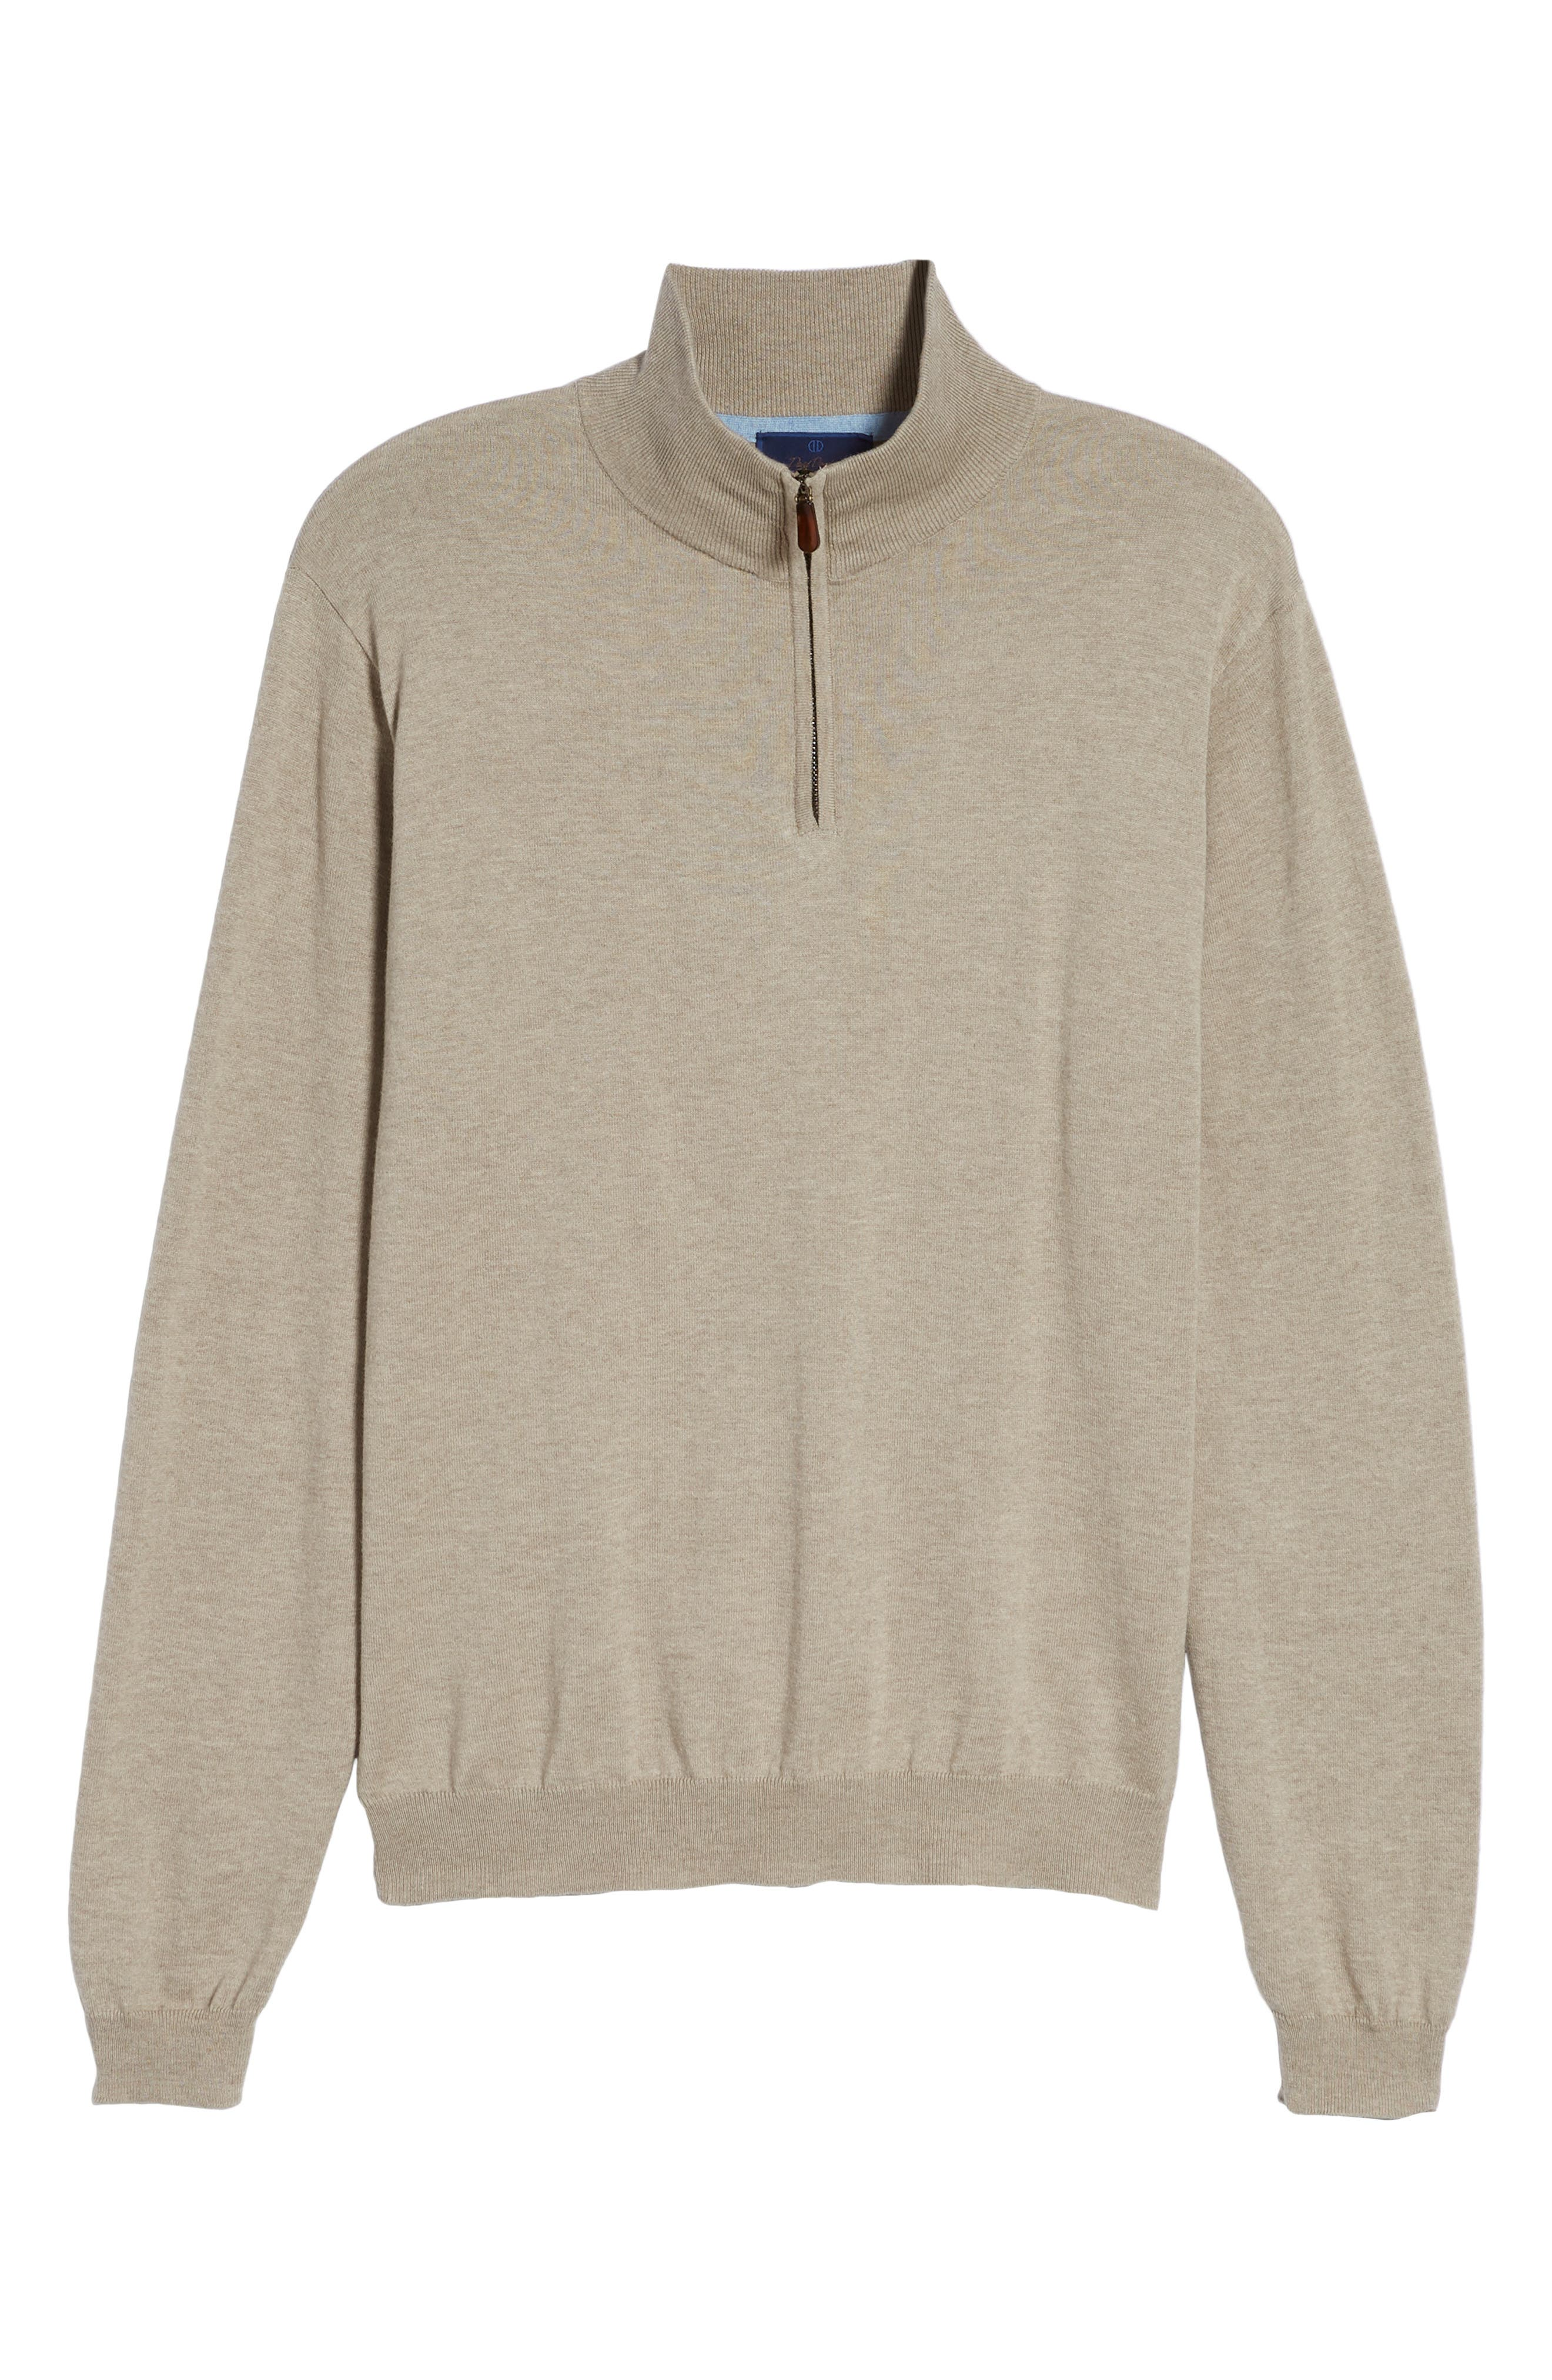 Cotton & Silk Quarter Zip Pullover,                             Alternate thumbnail 6, color,                             292